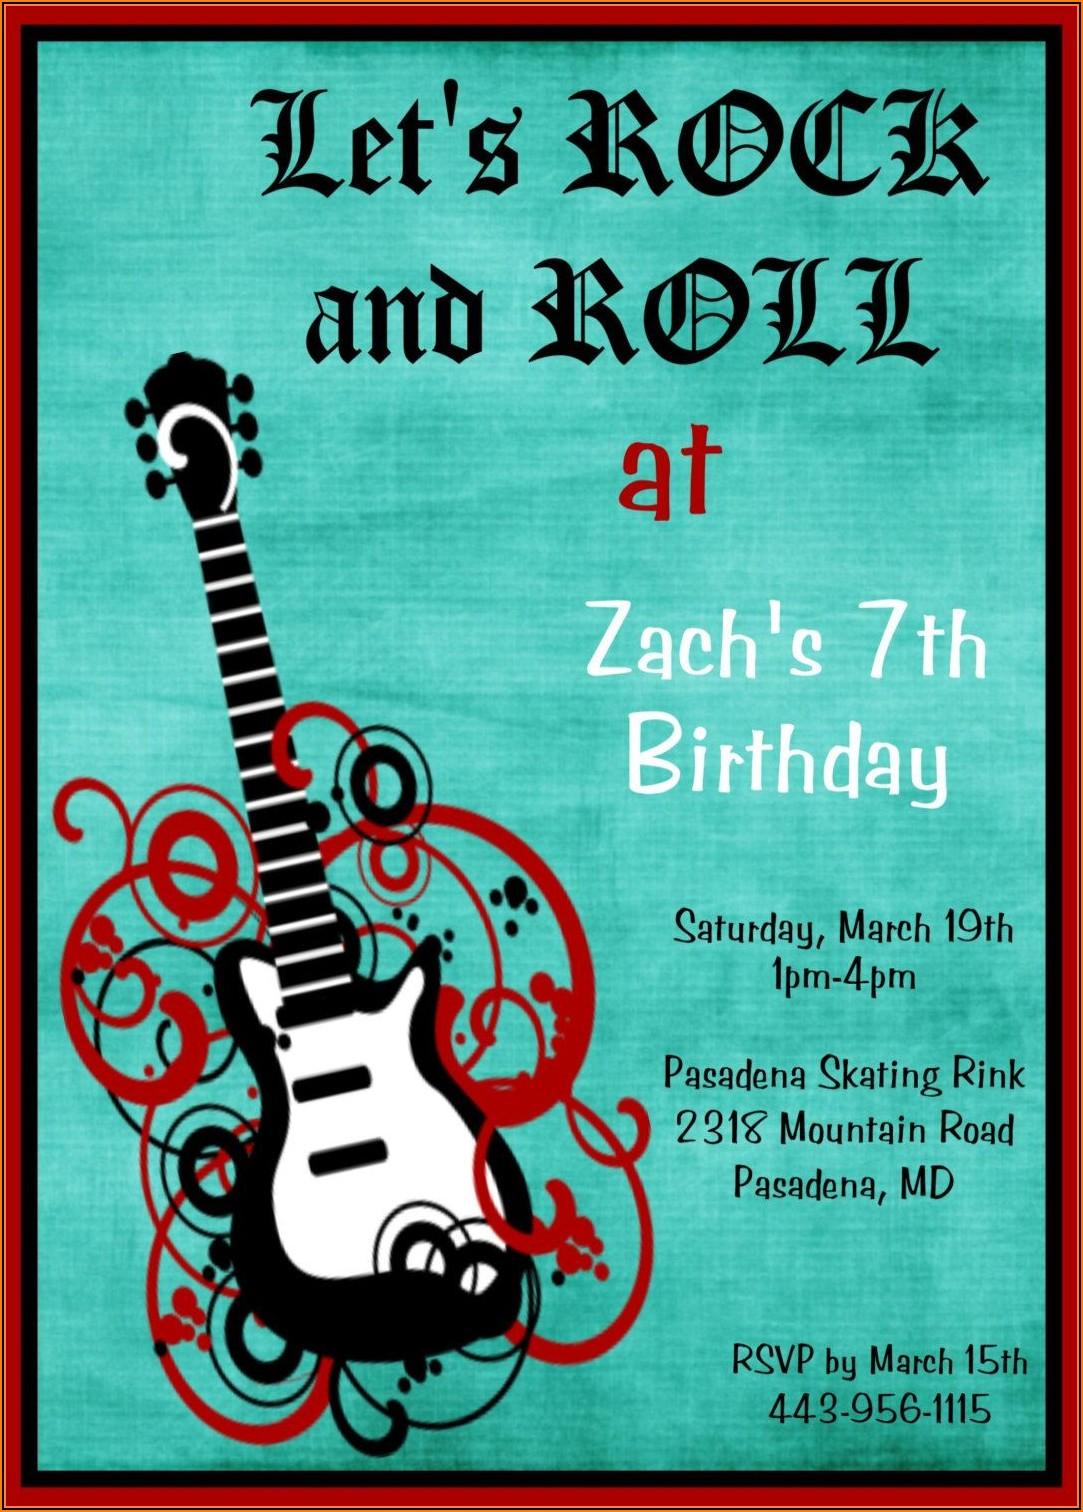 Rock Star Birthday Party Invitations Boy Templates